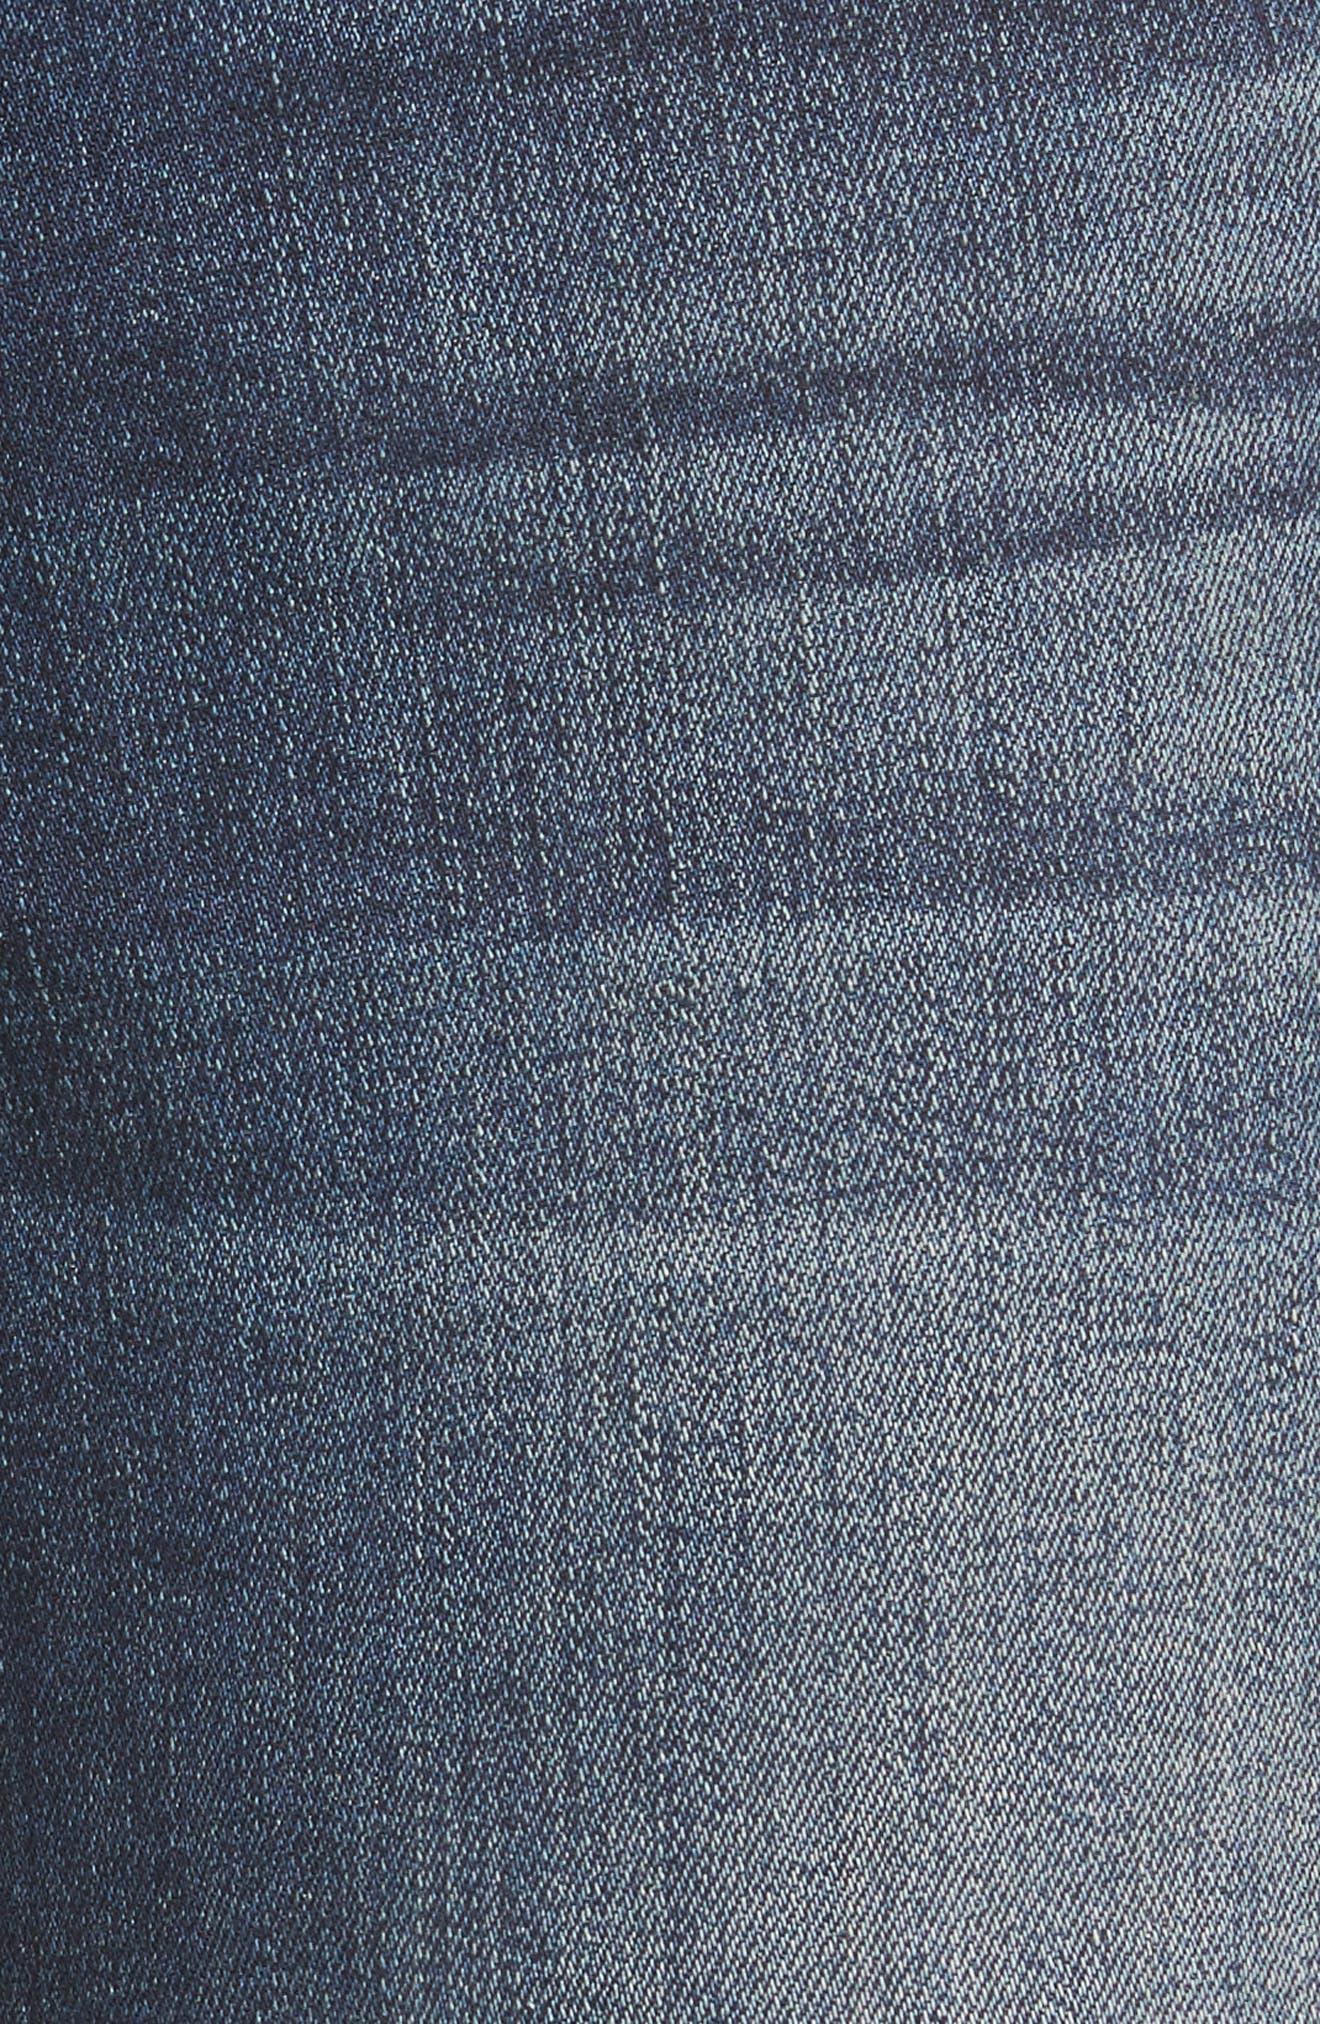 Taylor Ripped Eyelet Straight Leg Jeans,                             Alternate thumbnail 5, color,                             400